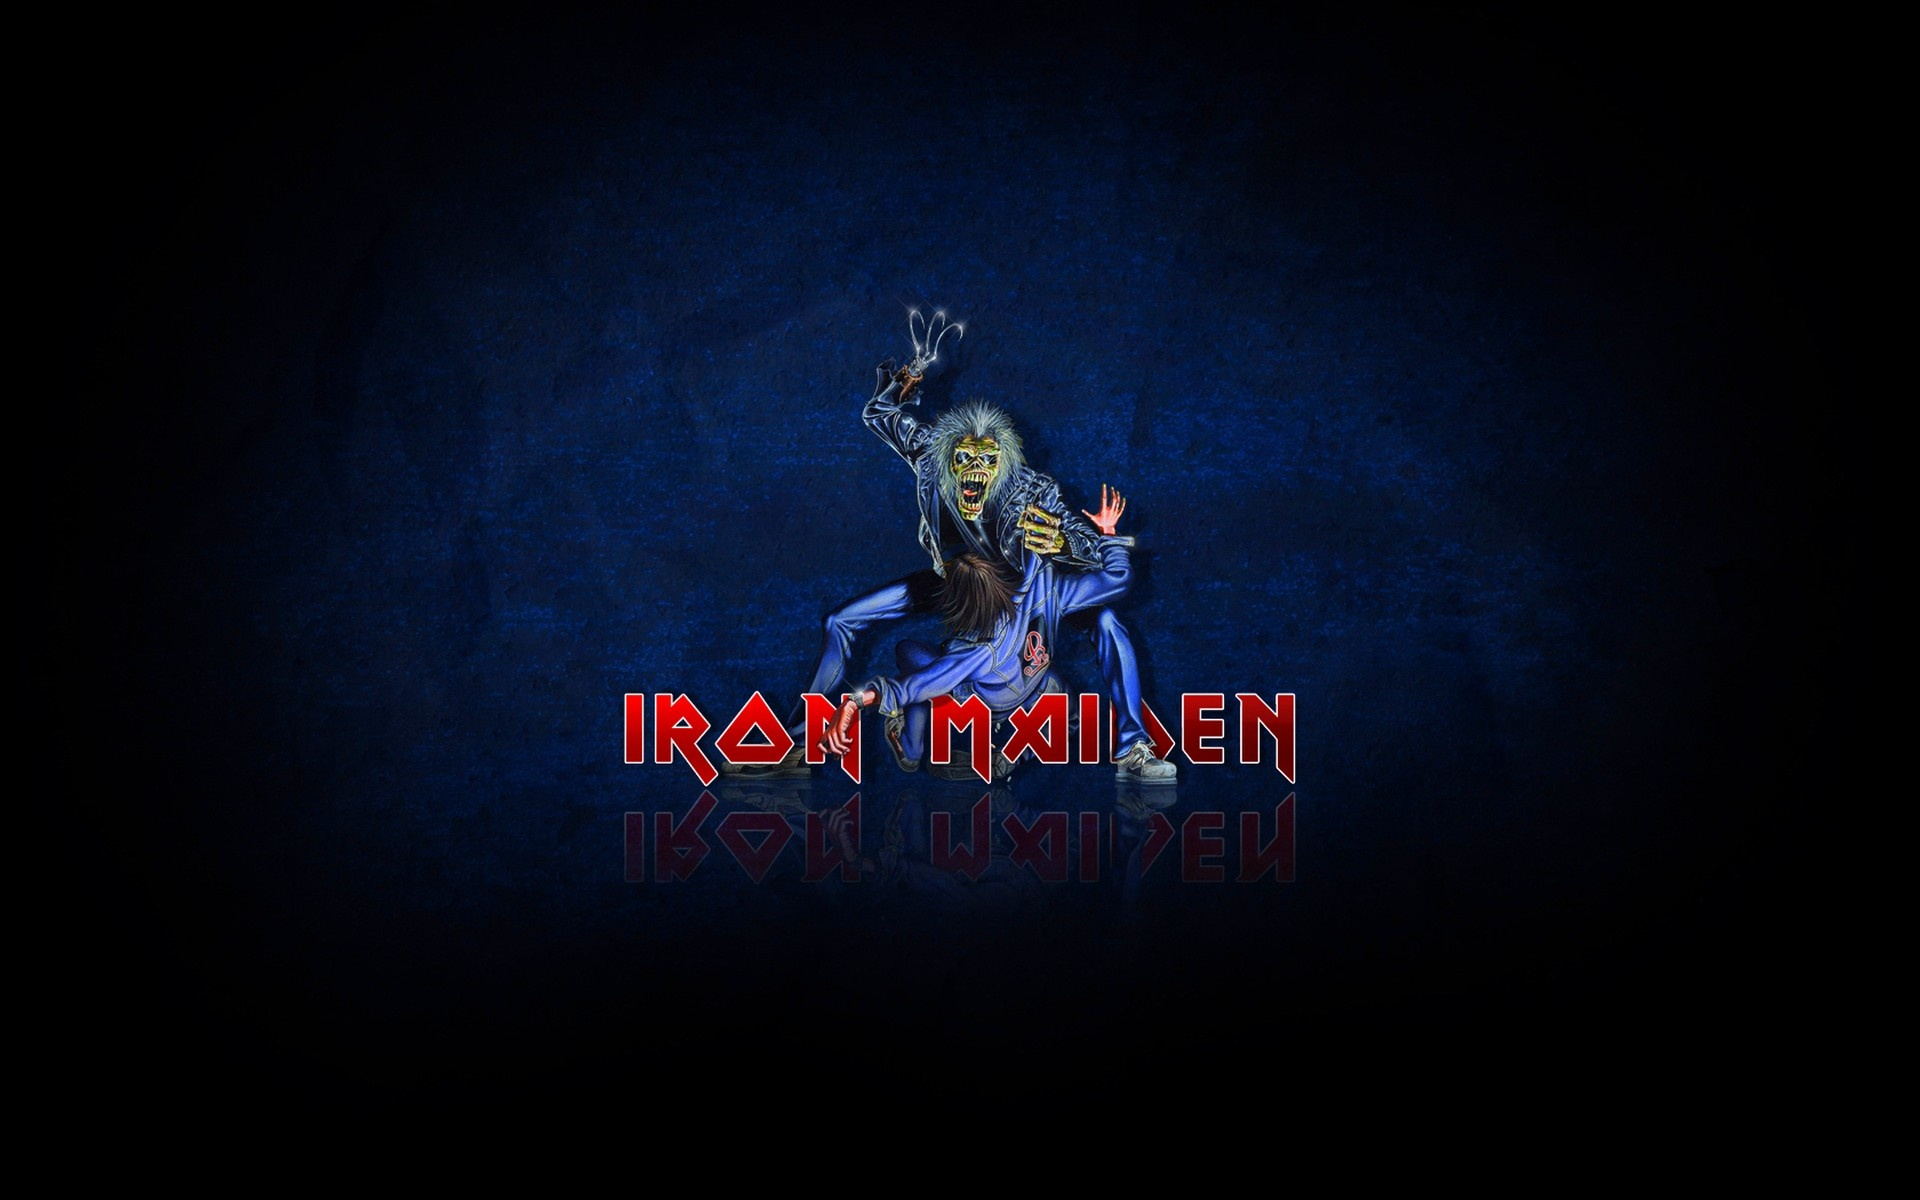 1920x1200 Iron Maiden Logo desktop wallpapers and stock photos 1920x1200